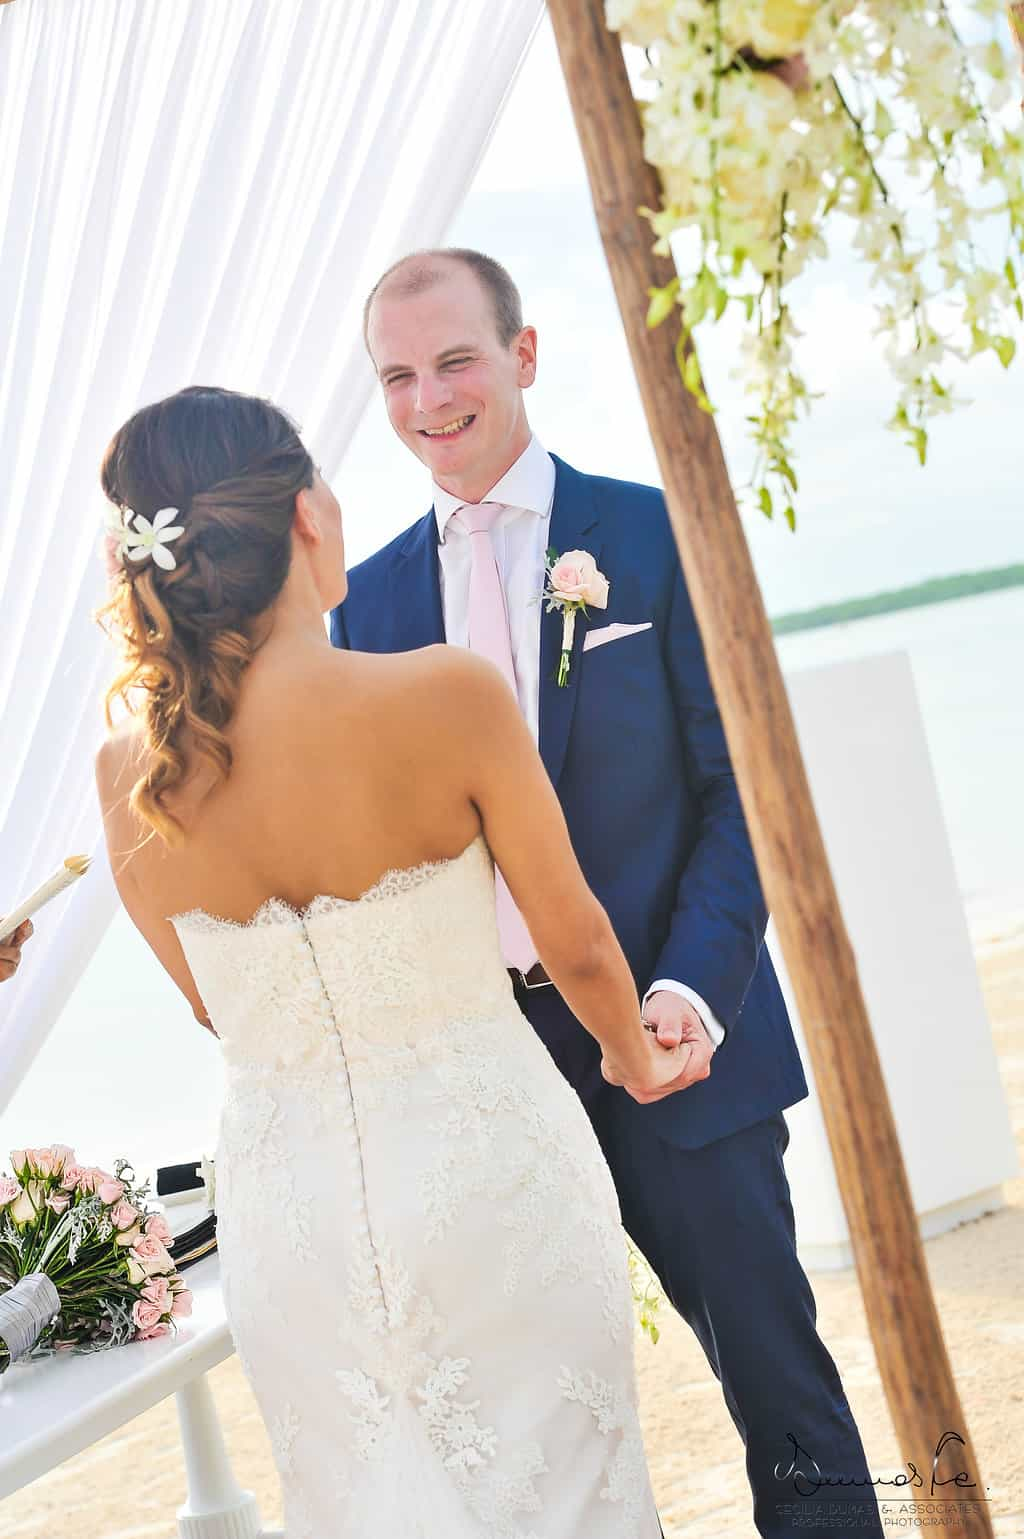 hotelnizuccancun-weddingphotography-laurathibaut48